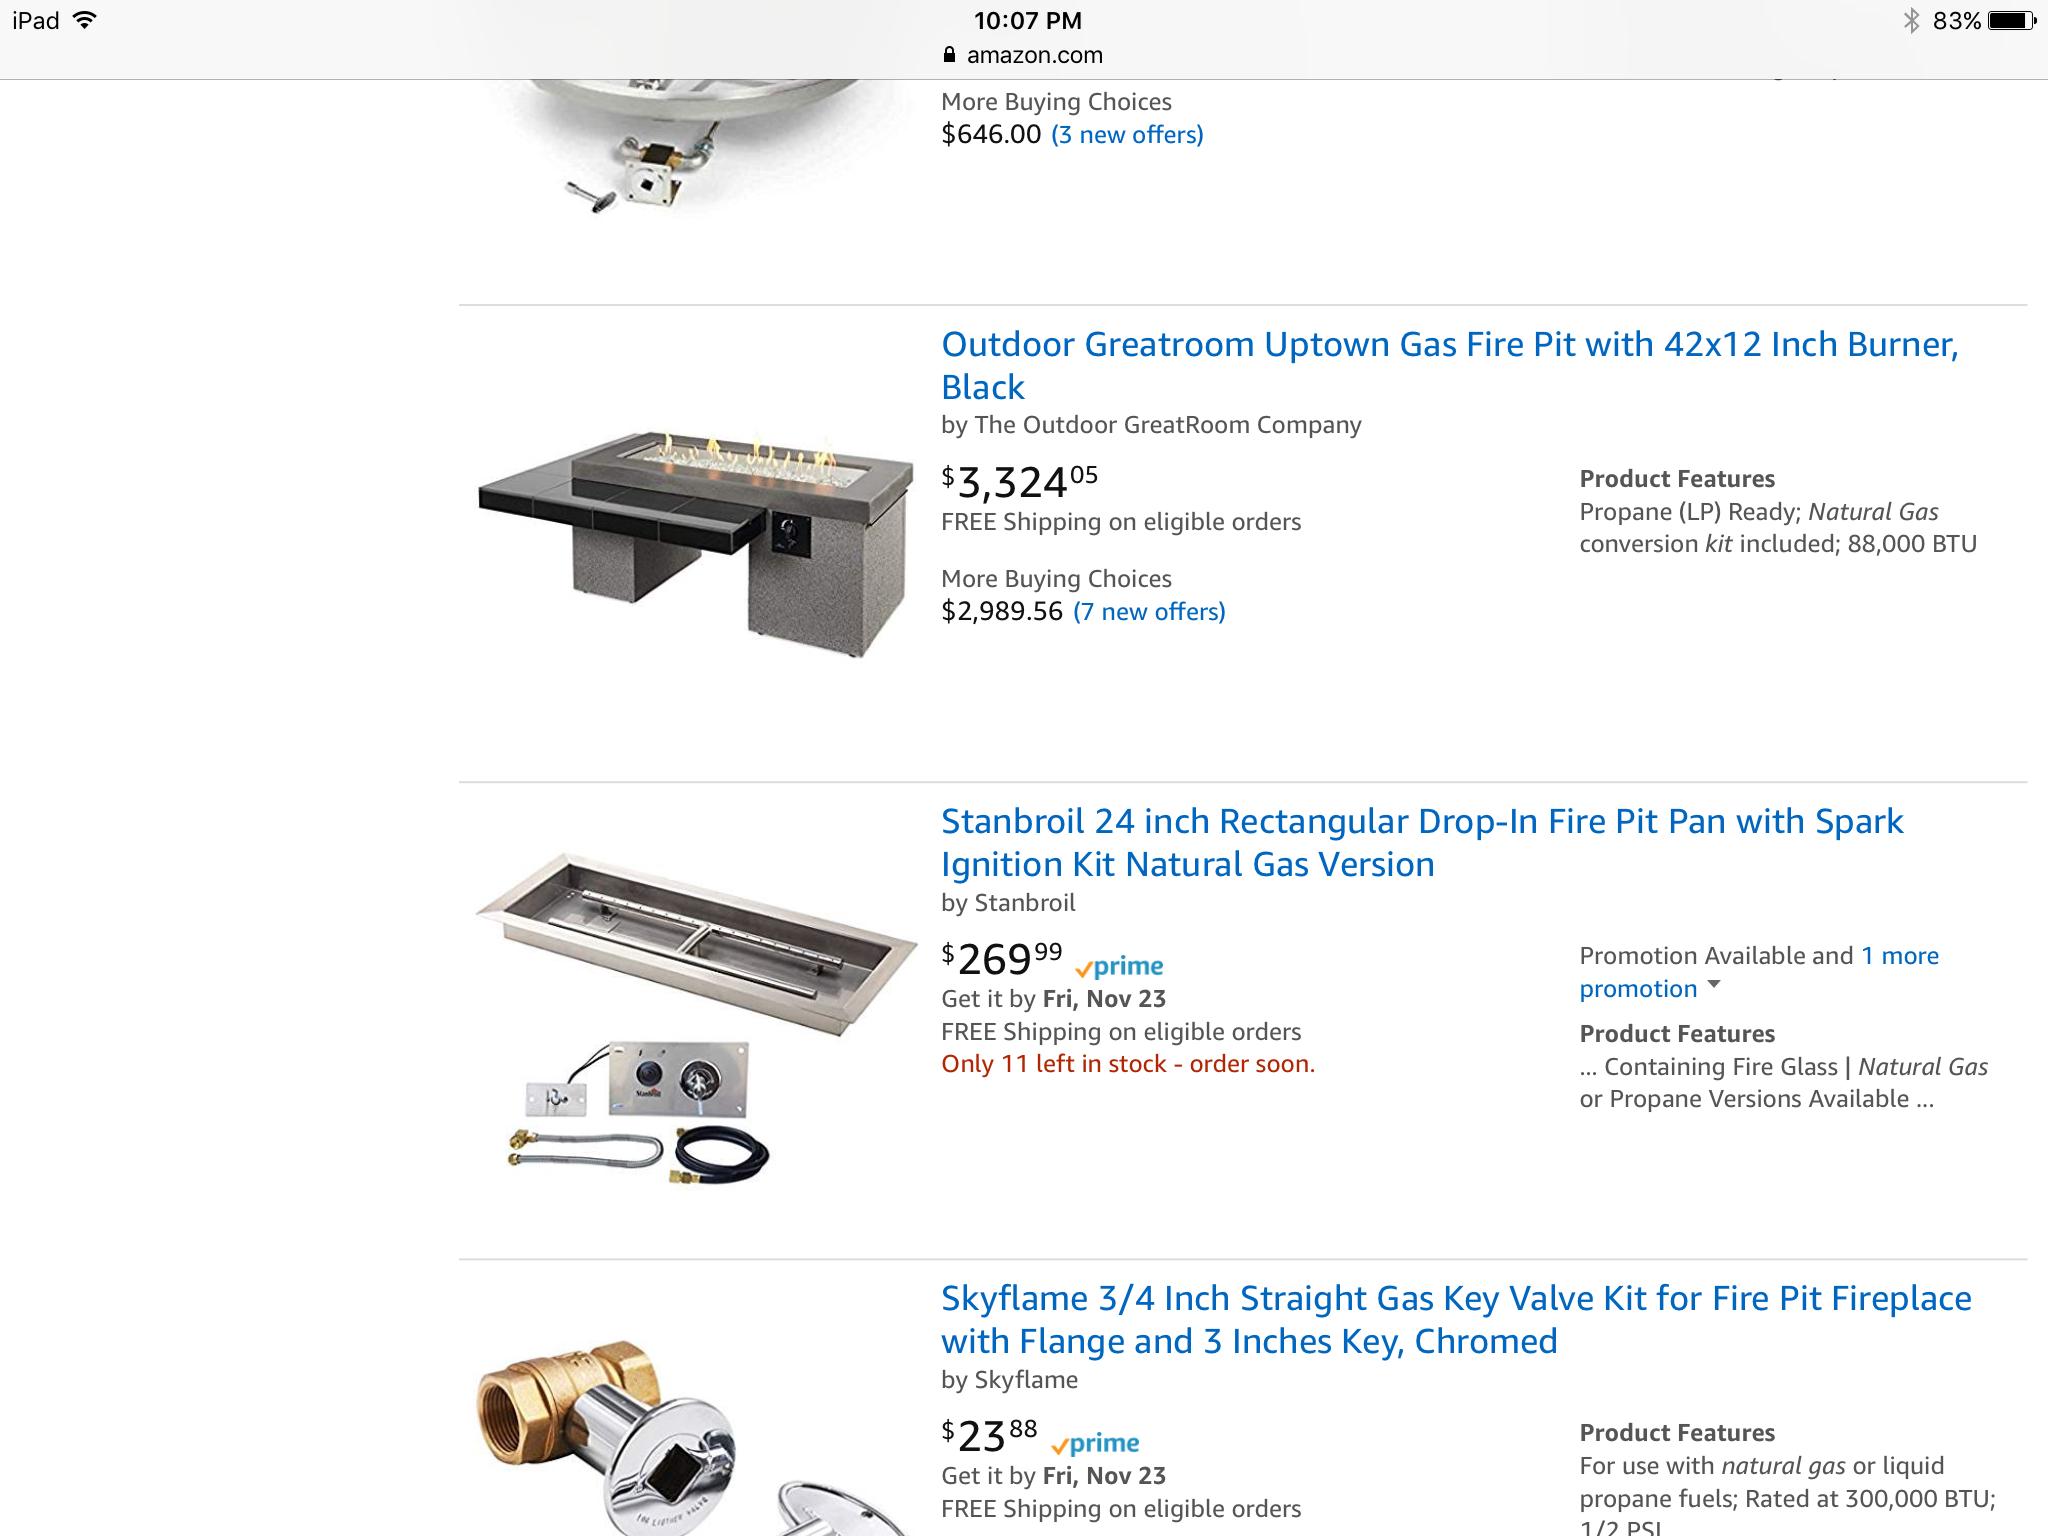 Pin By Richard Draeger On Remodeling Backyard Gas Firepit Stuff To Buy Propane